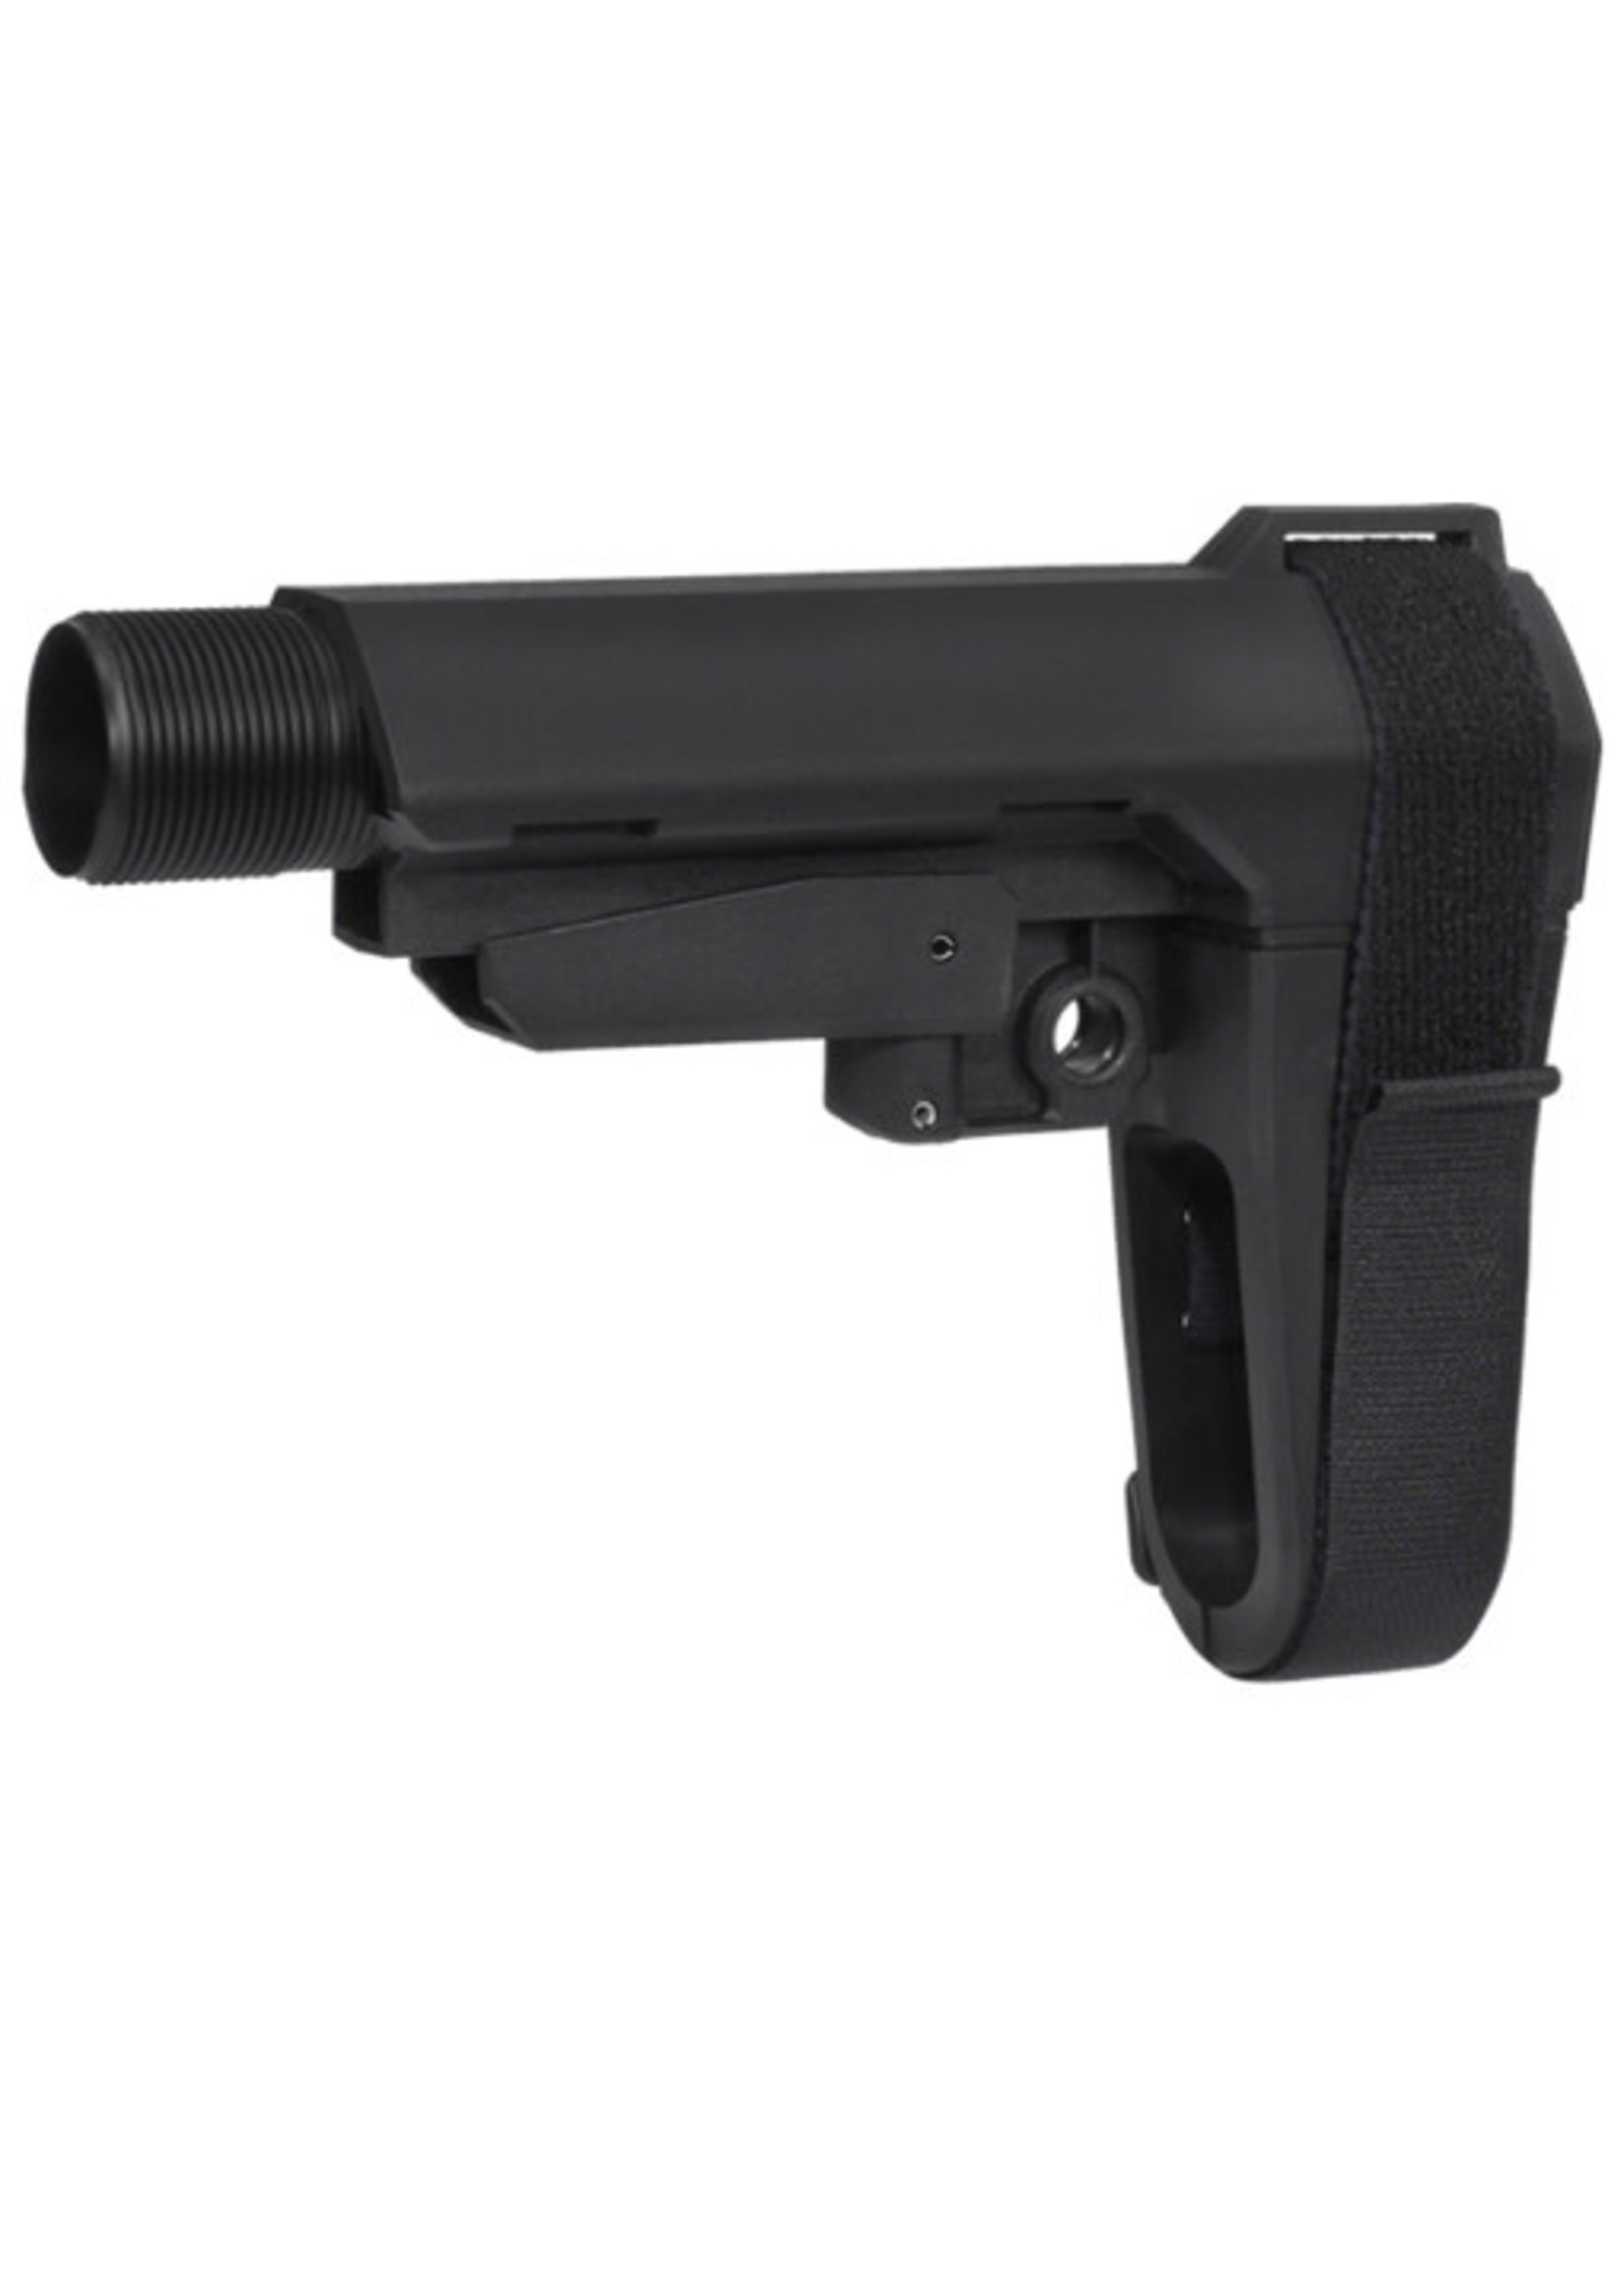 SB Tactical SB Tactical AR Brace SBA3 Pistol Stabilizing Brace w/ Mil-Spec Buffer Tube, black